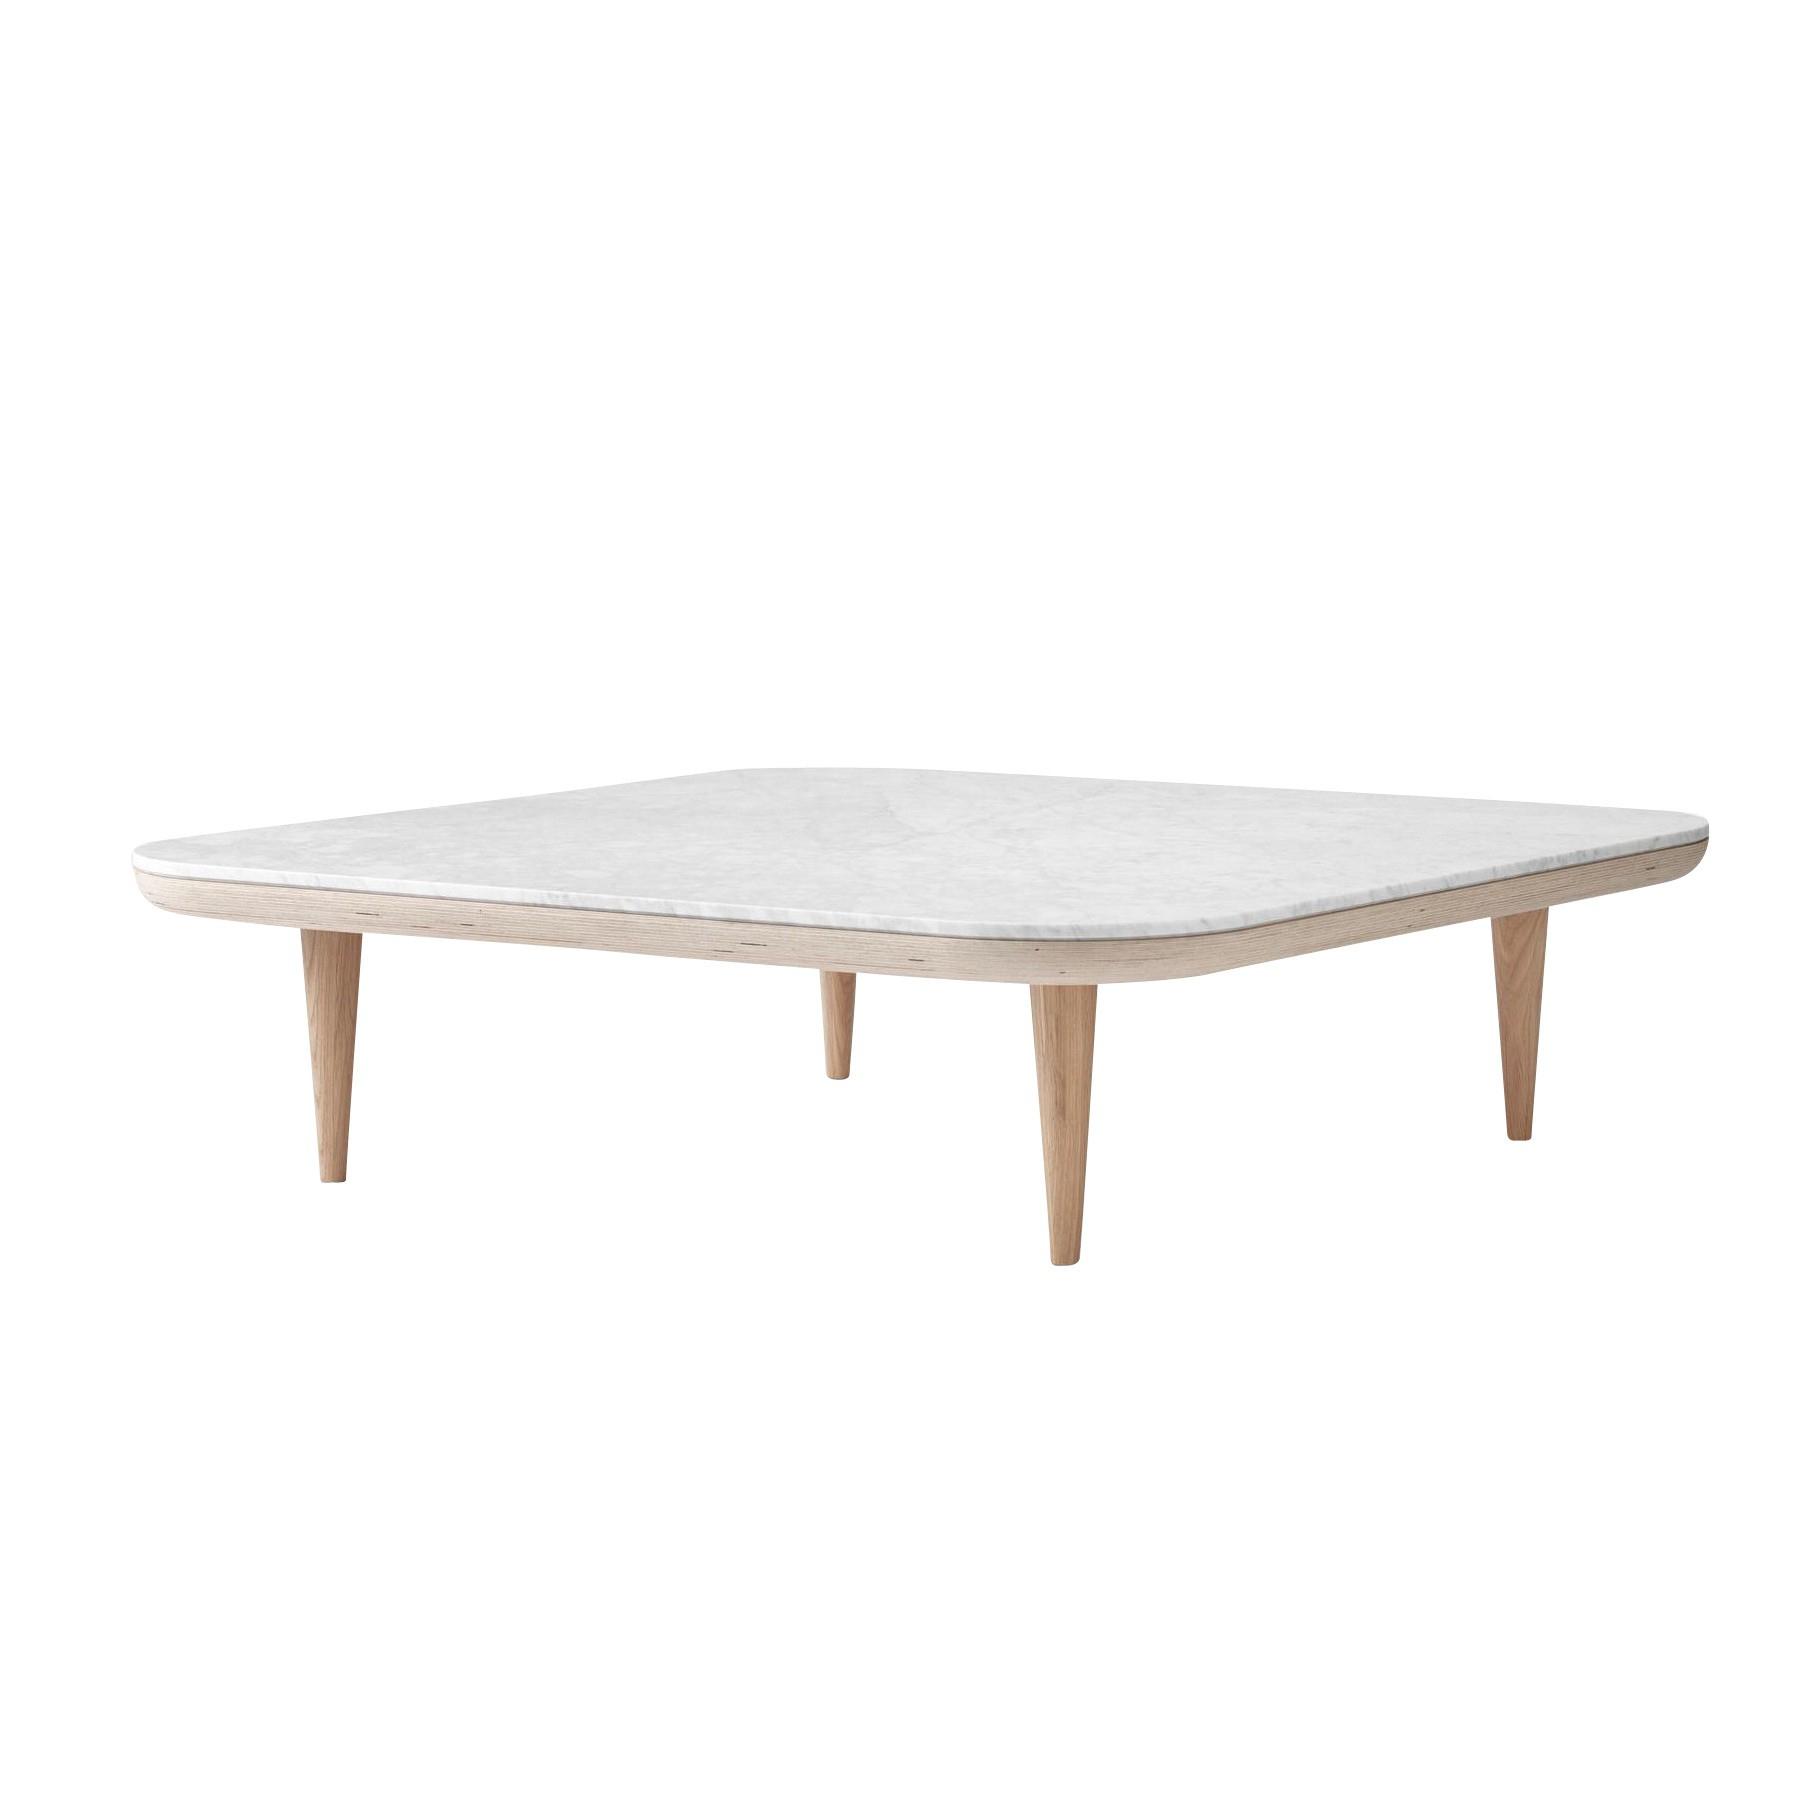 Fly Table Sc11 - Table Basse 120X120Cm concernant Fly Mobilier De Jardin